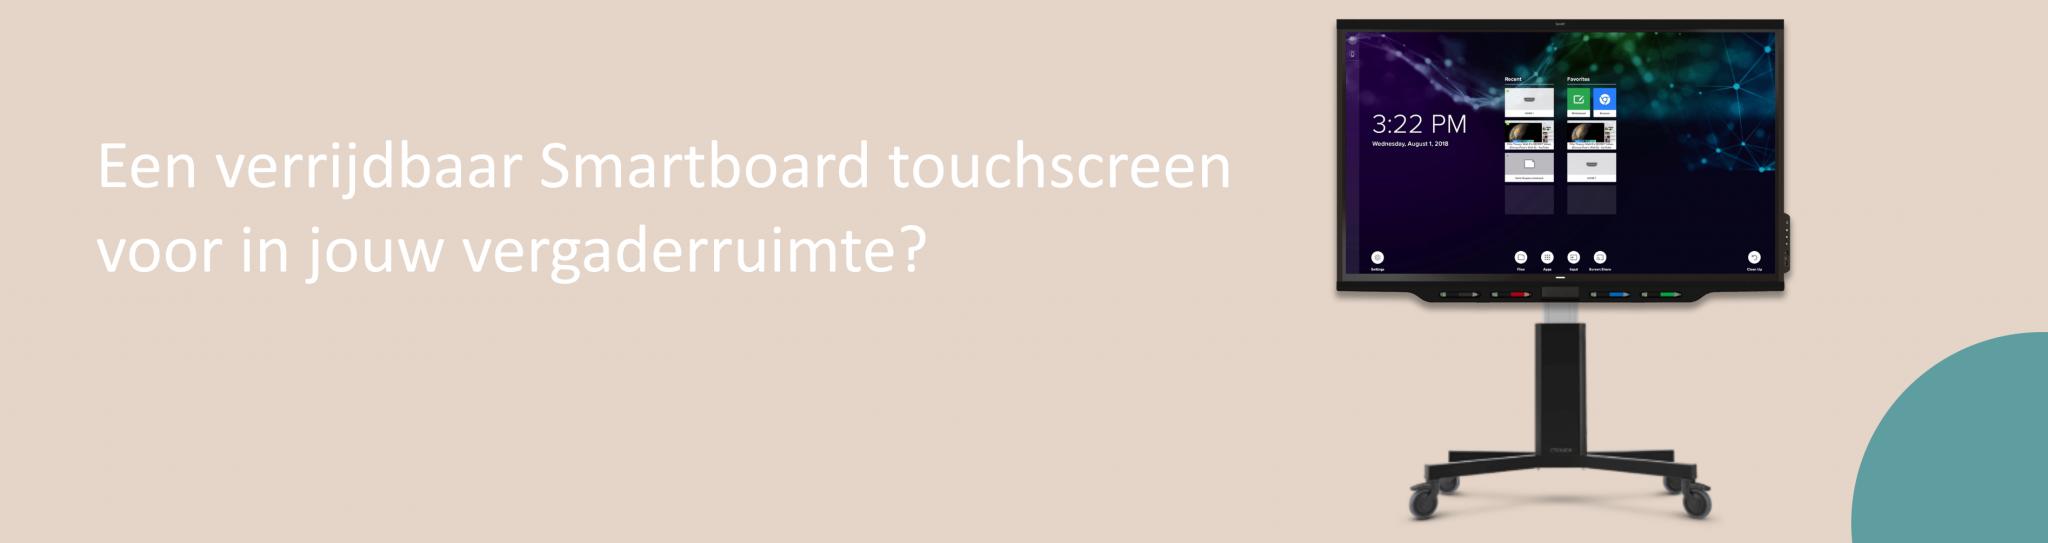 Smartboard touchscreen